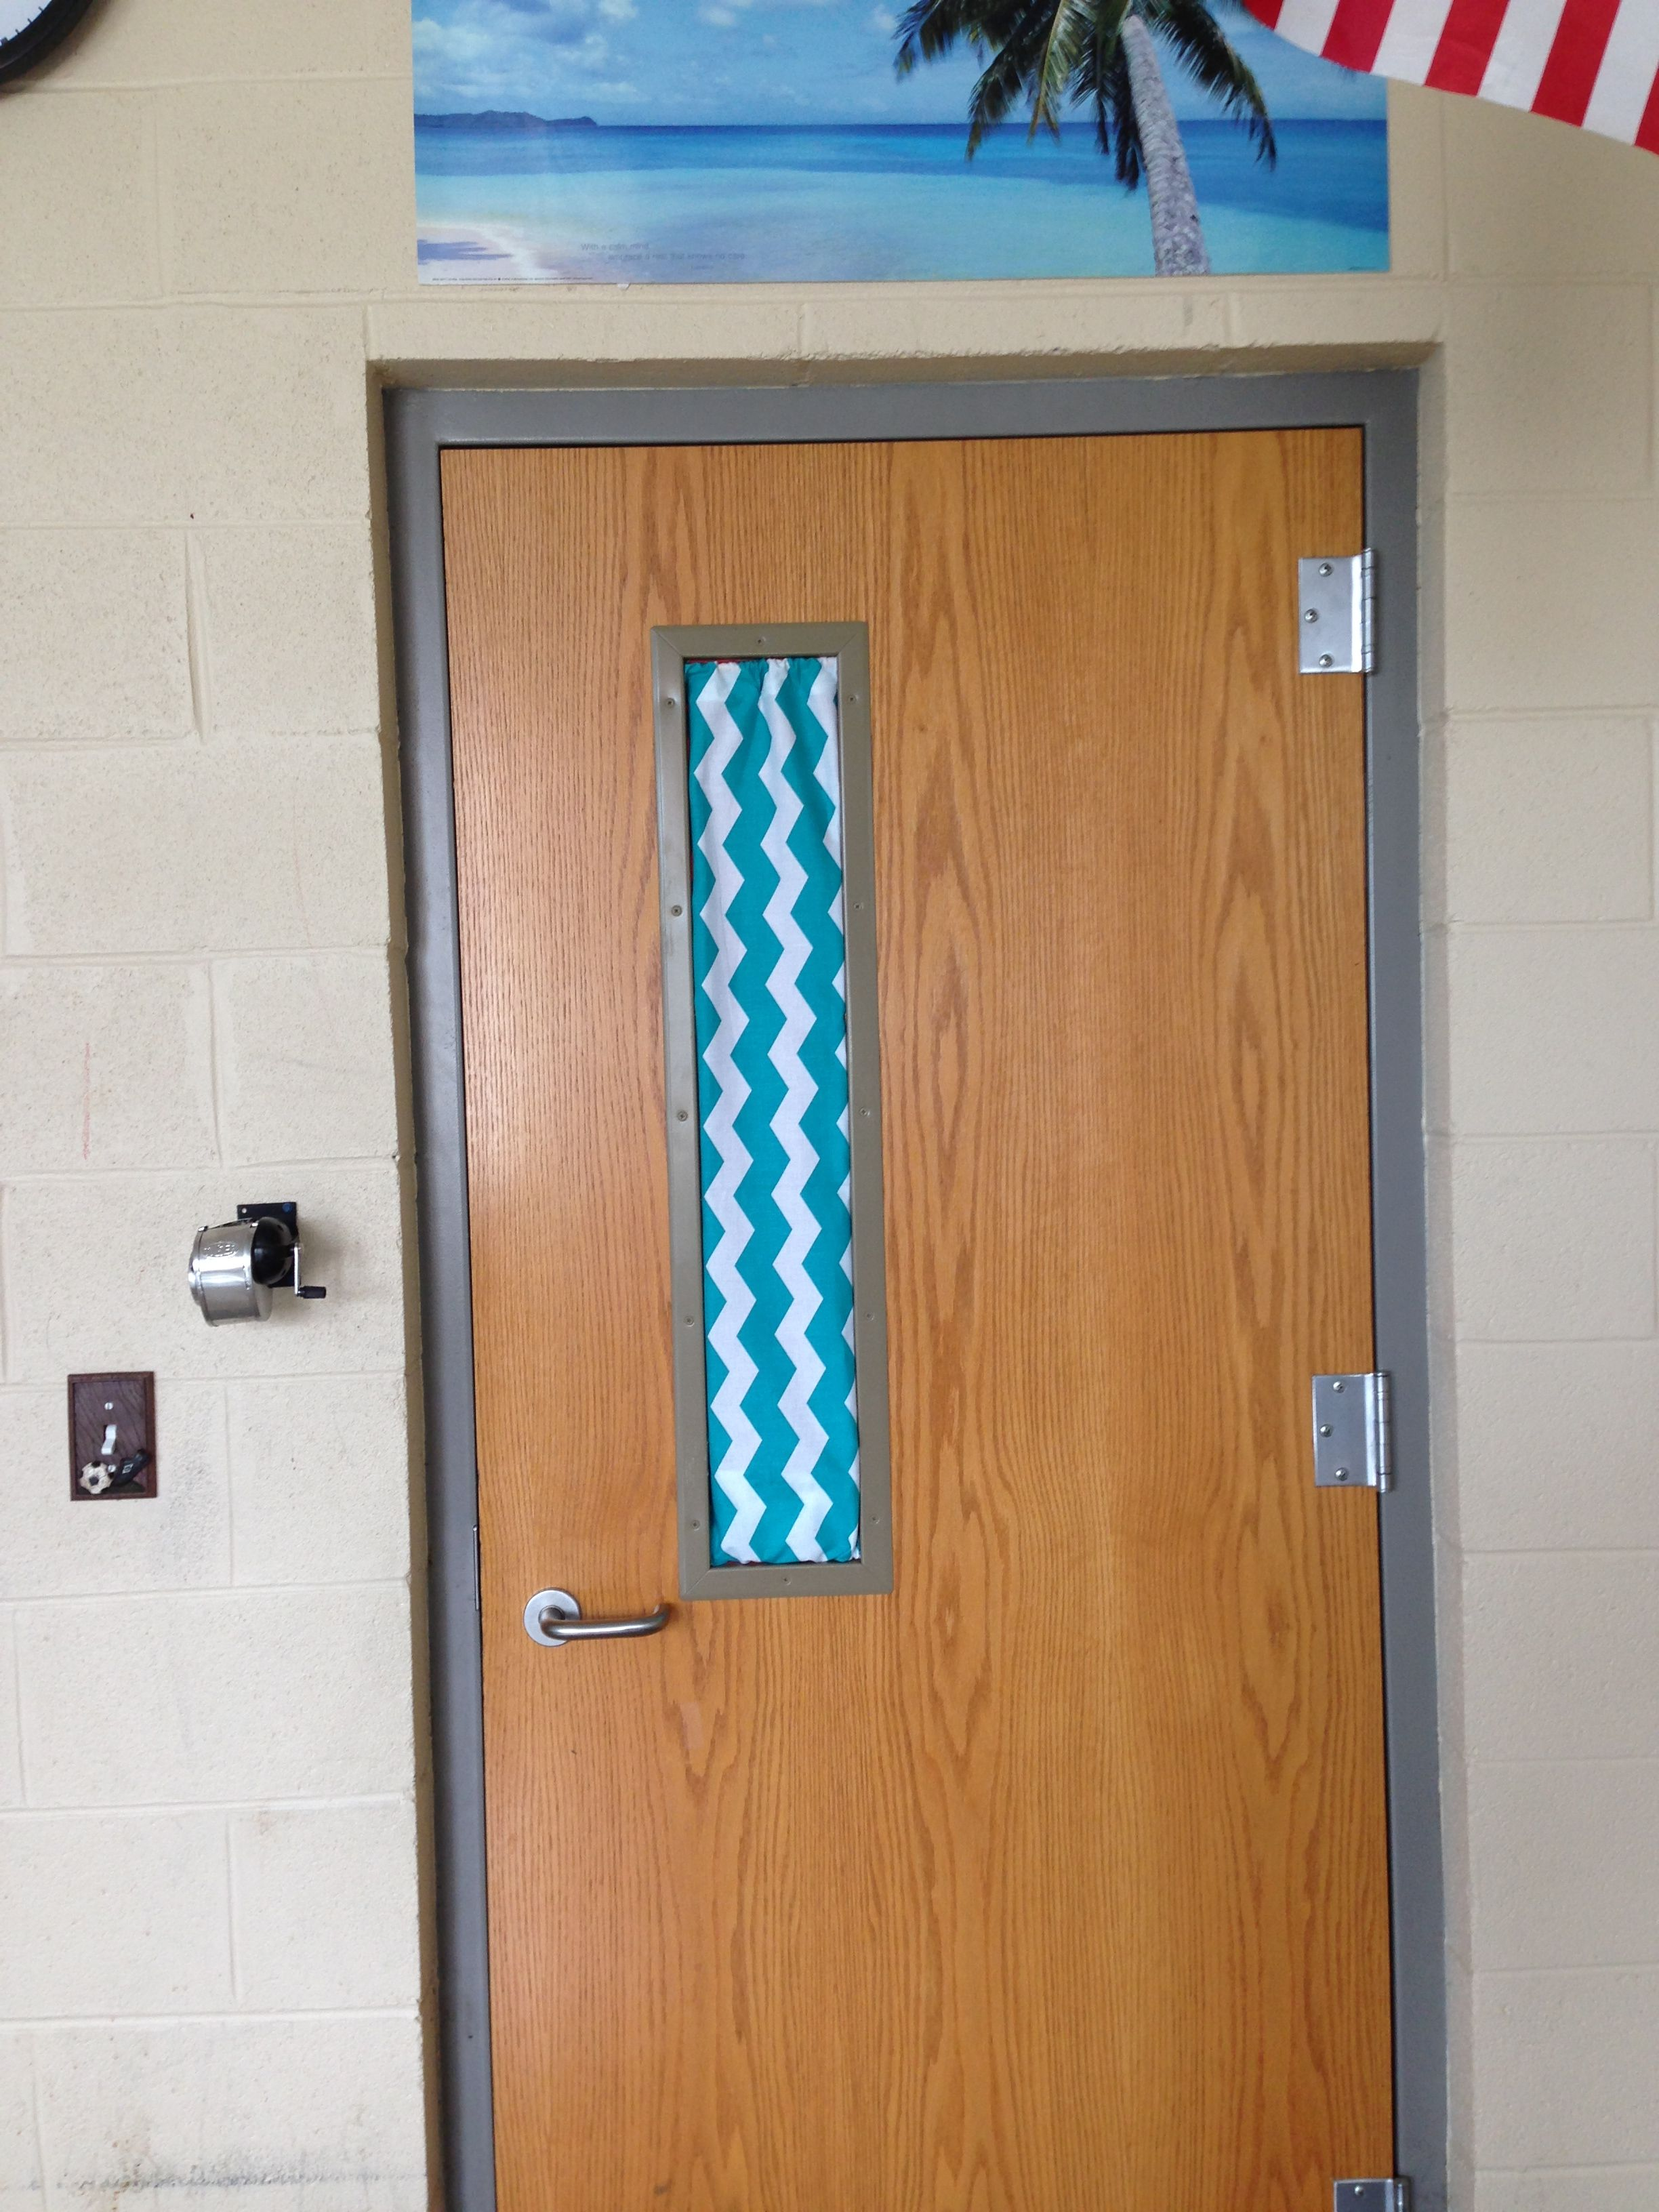 Classroom door window cover!!! I actually used pencils as